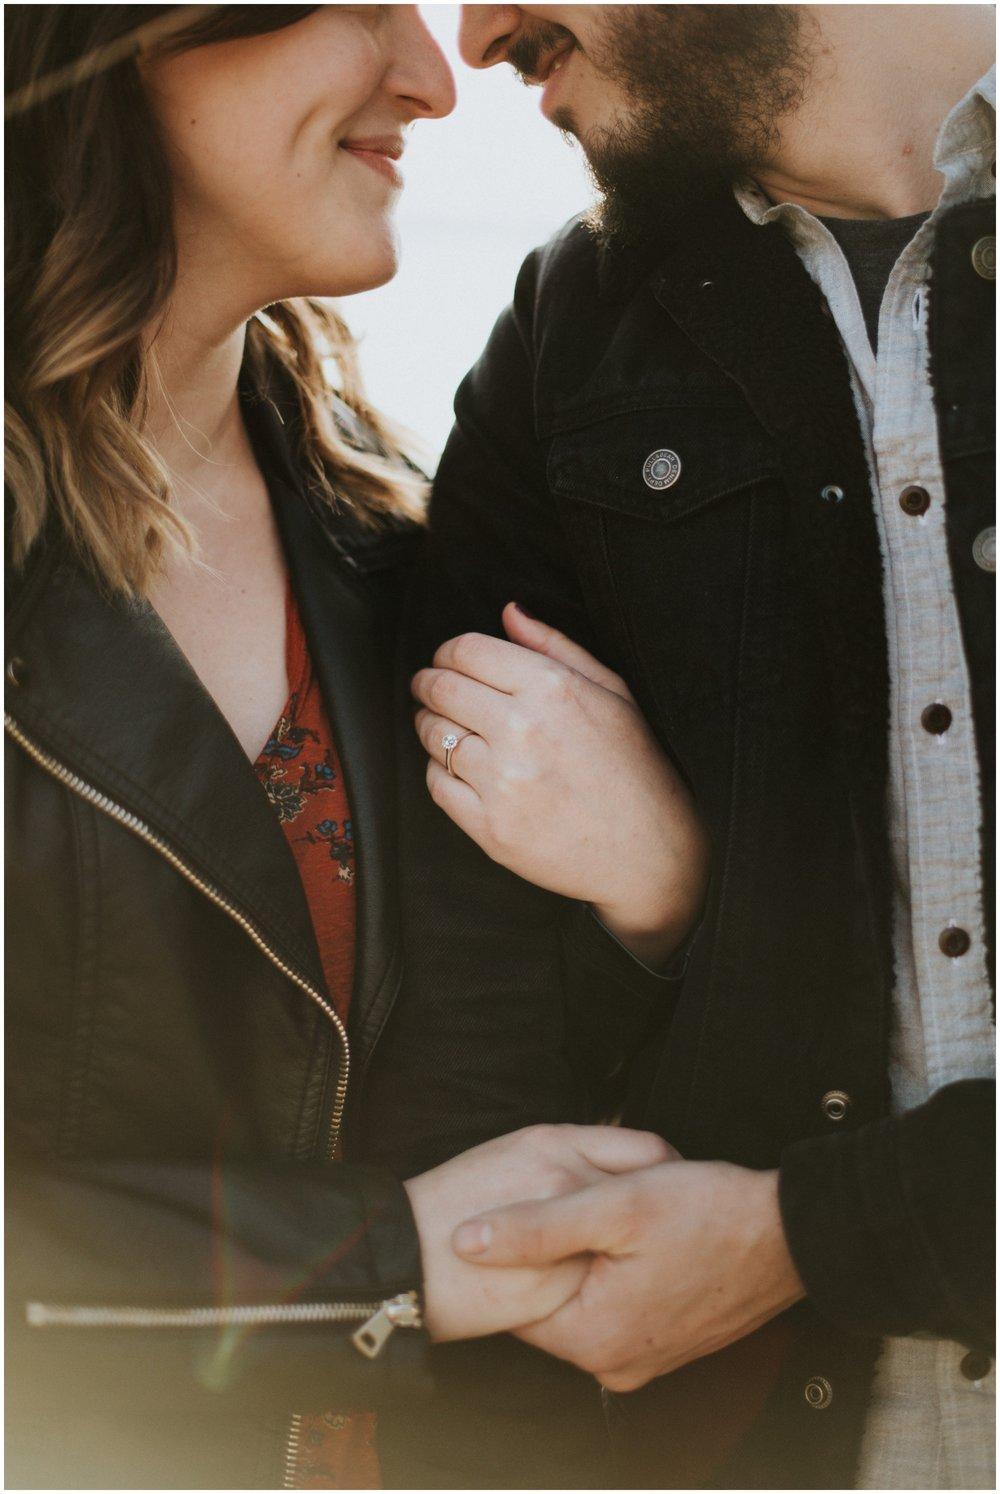 close up shot of engagement ring | Seattle Engagement Photographer www.riversandroadsphotography.com